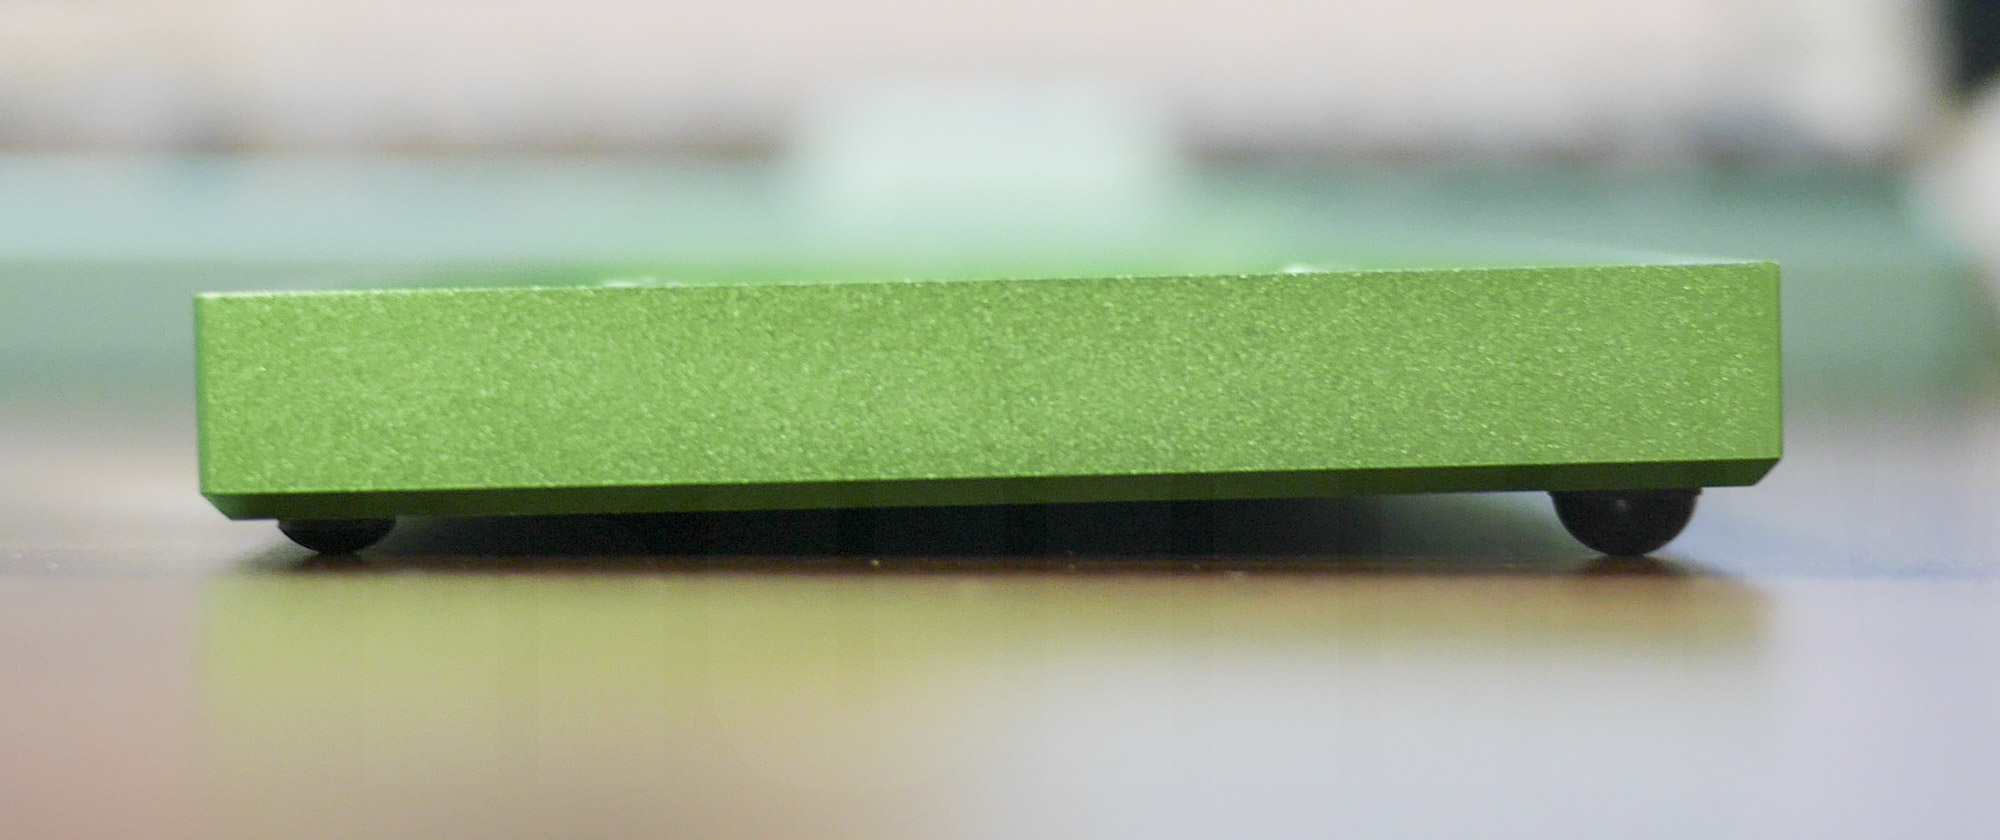 Planck Keyboard: ゴム足による傾斜作成2